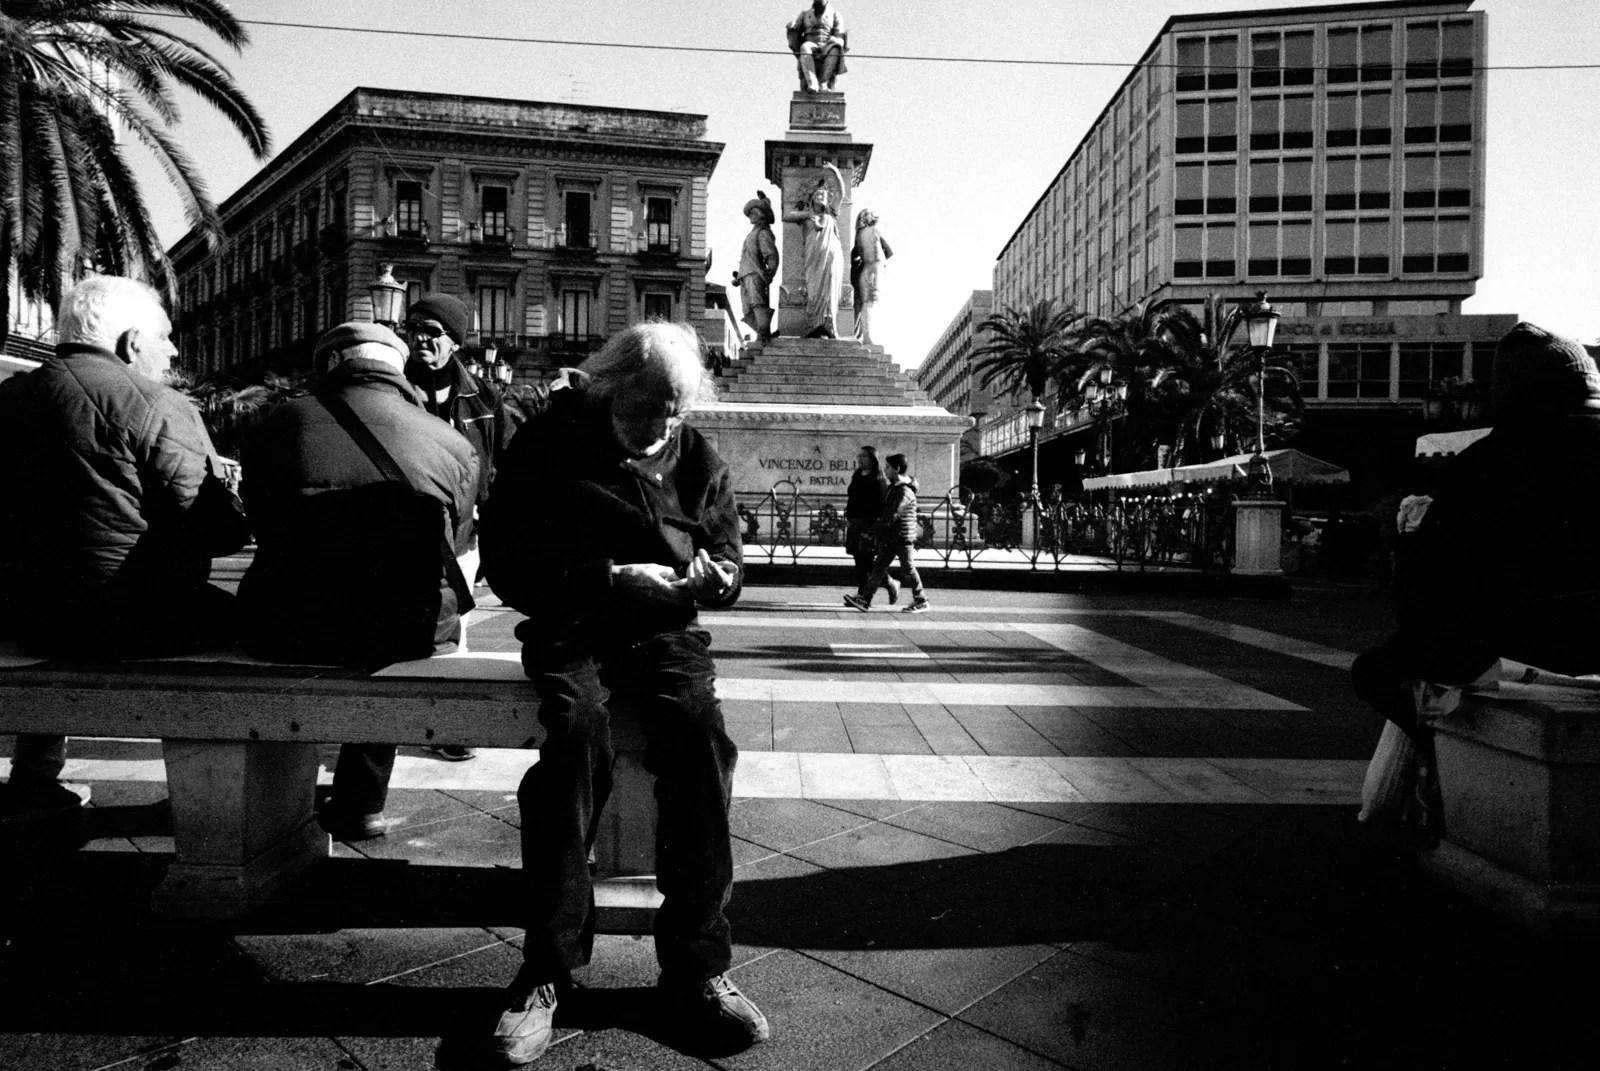 Leica M6 - Kodak TriX 400 - Catania 2017